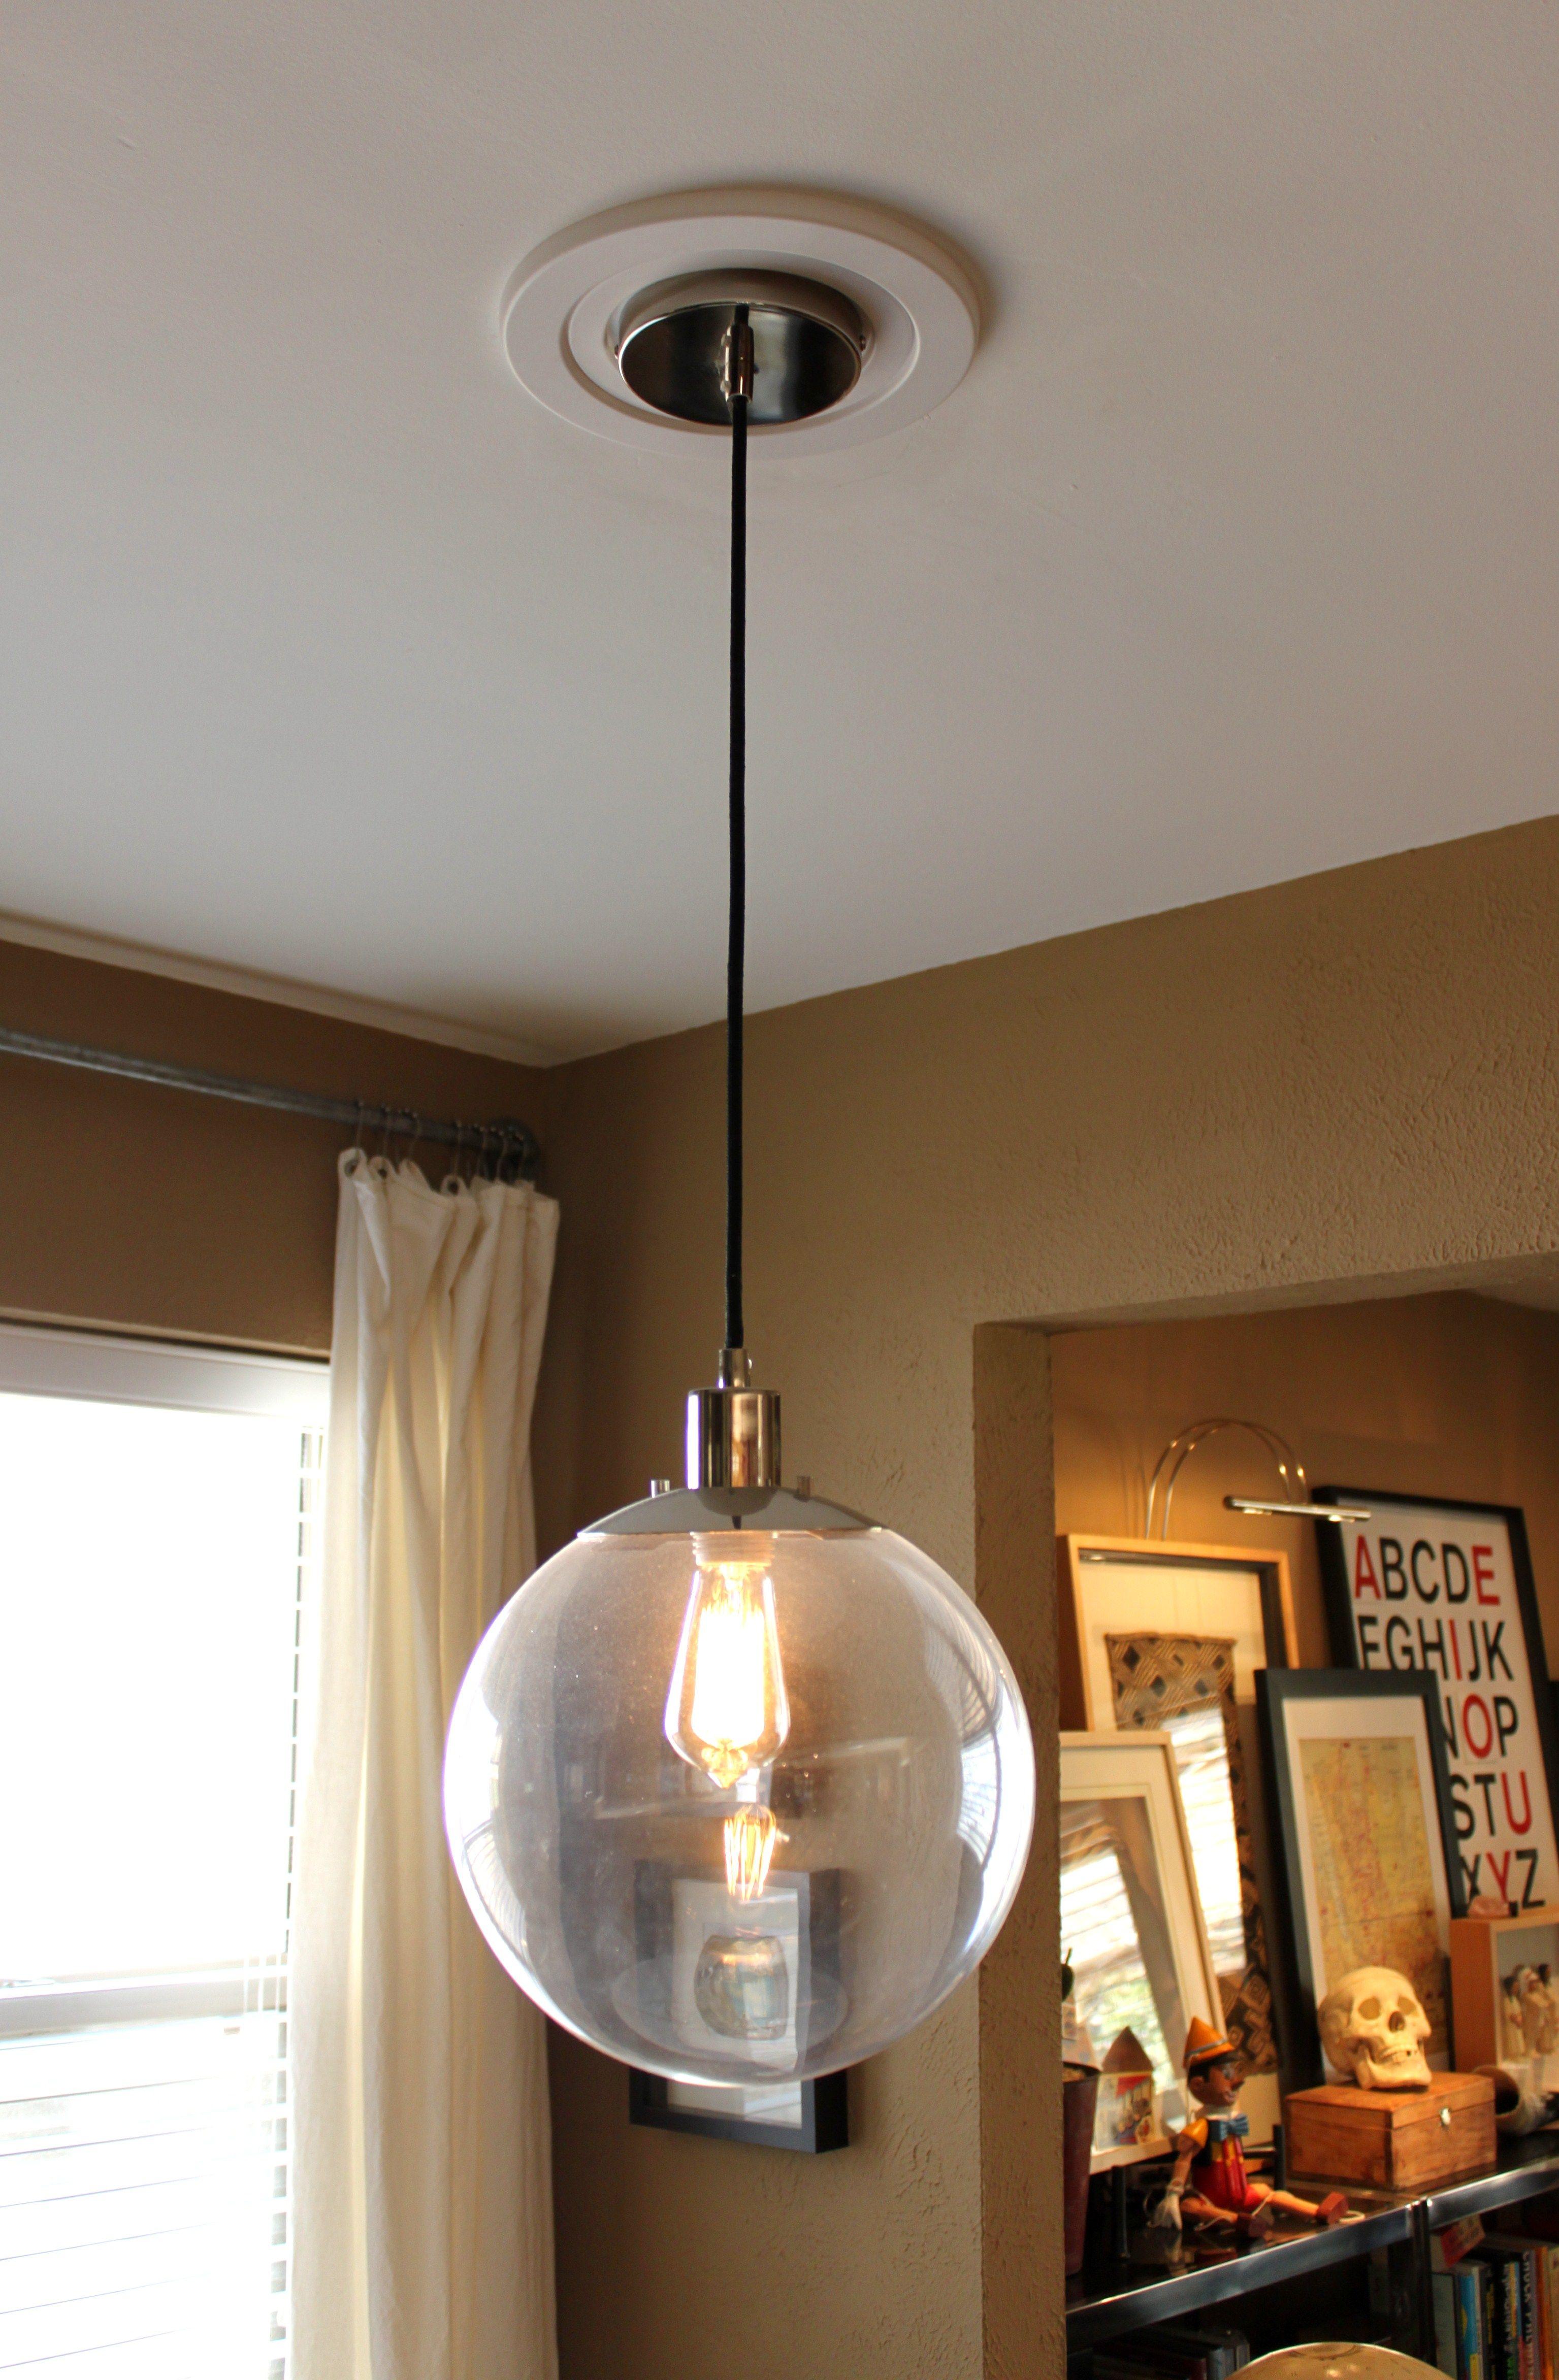 West elm ball pendant farmhouse lightingindustrial lighting